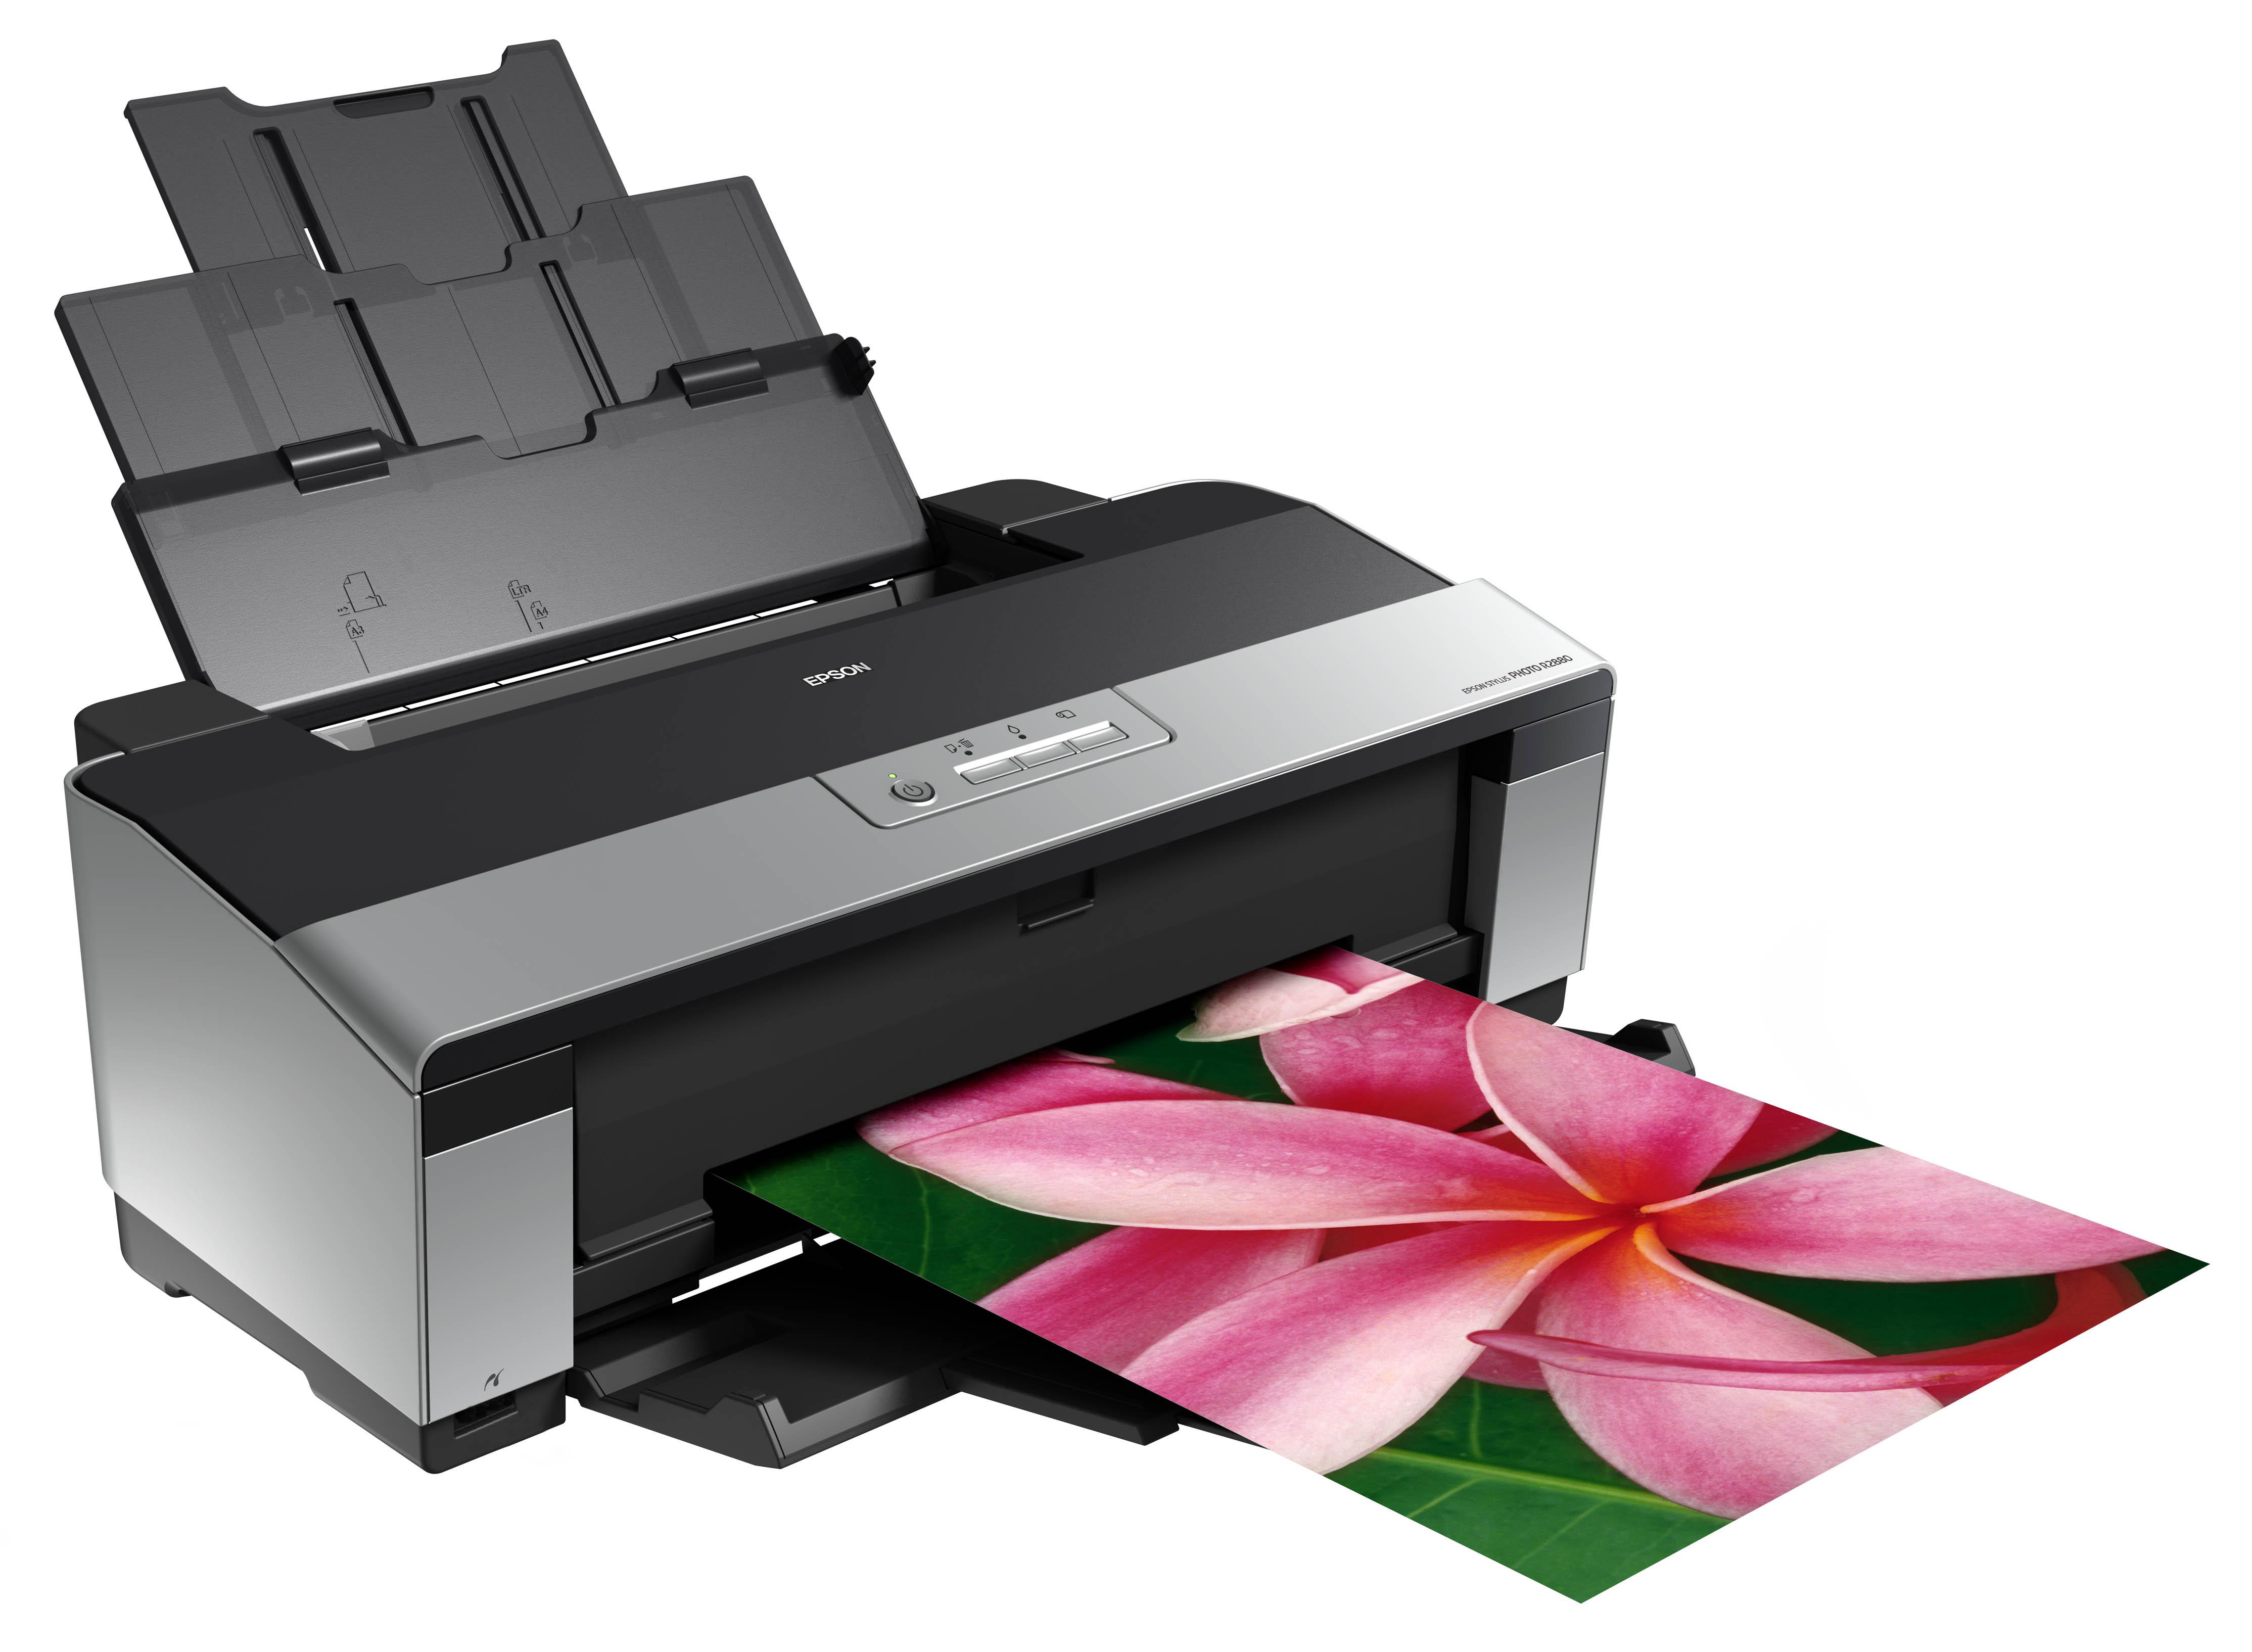 Epson stylus photo r2400 inkjet printer